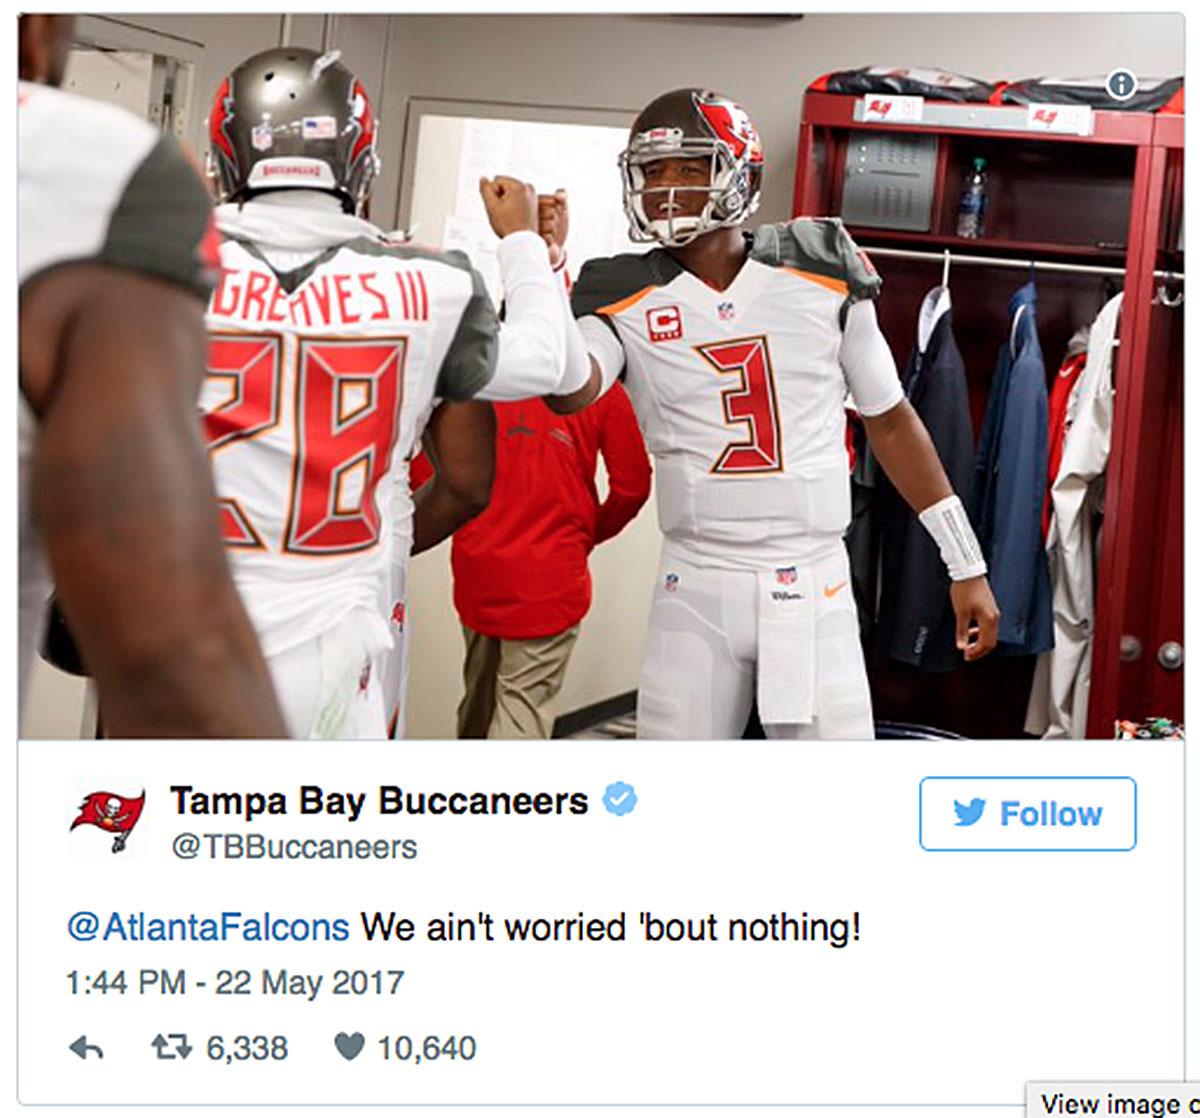 Bucs Coach Apologizes For Tweet Mocking Falcons' Super Bowl Collapse